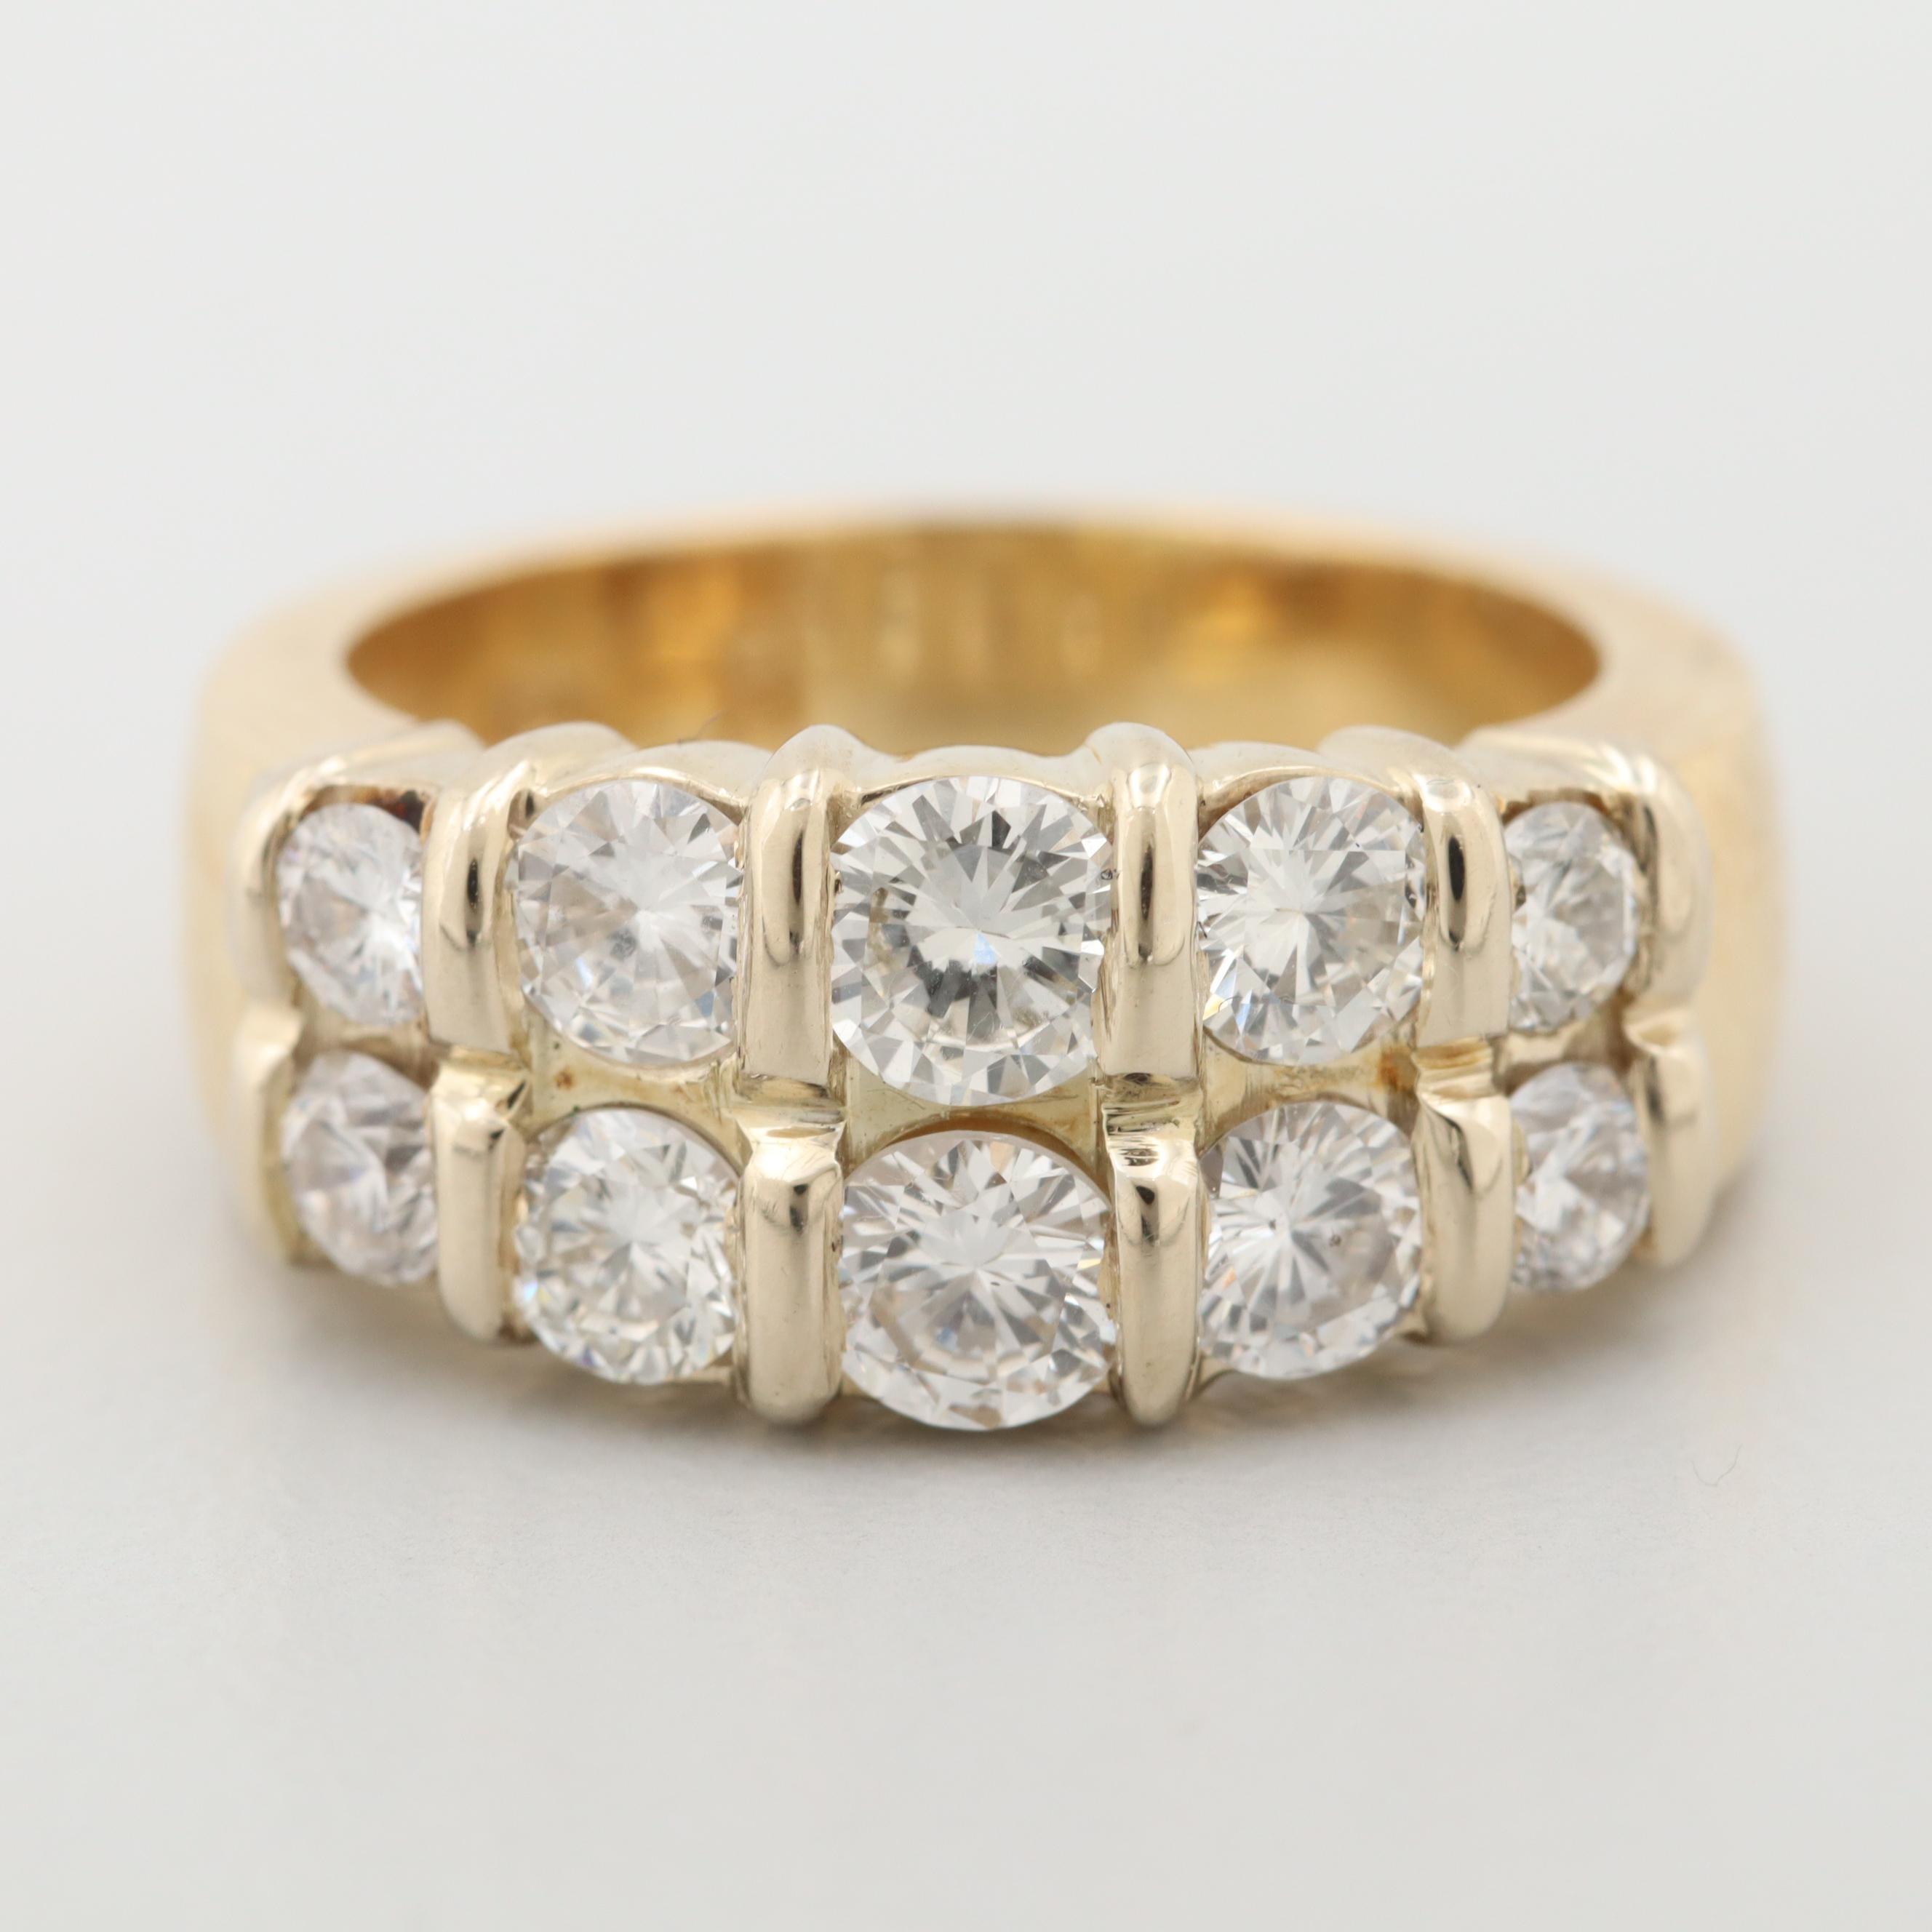 18K Yellow Gold 1.50 CTW Diamond Ring